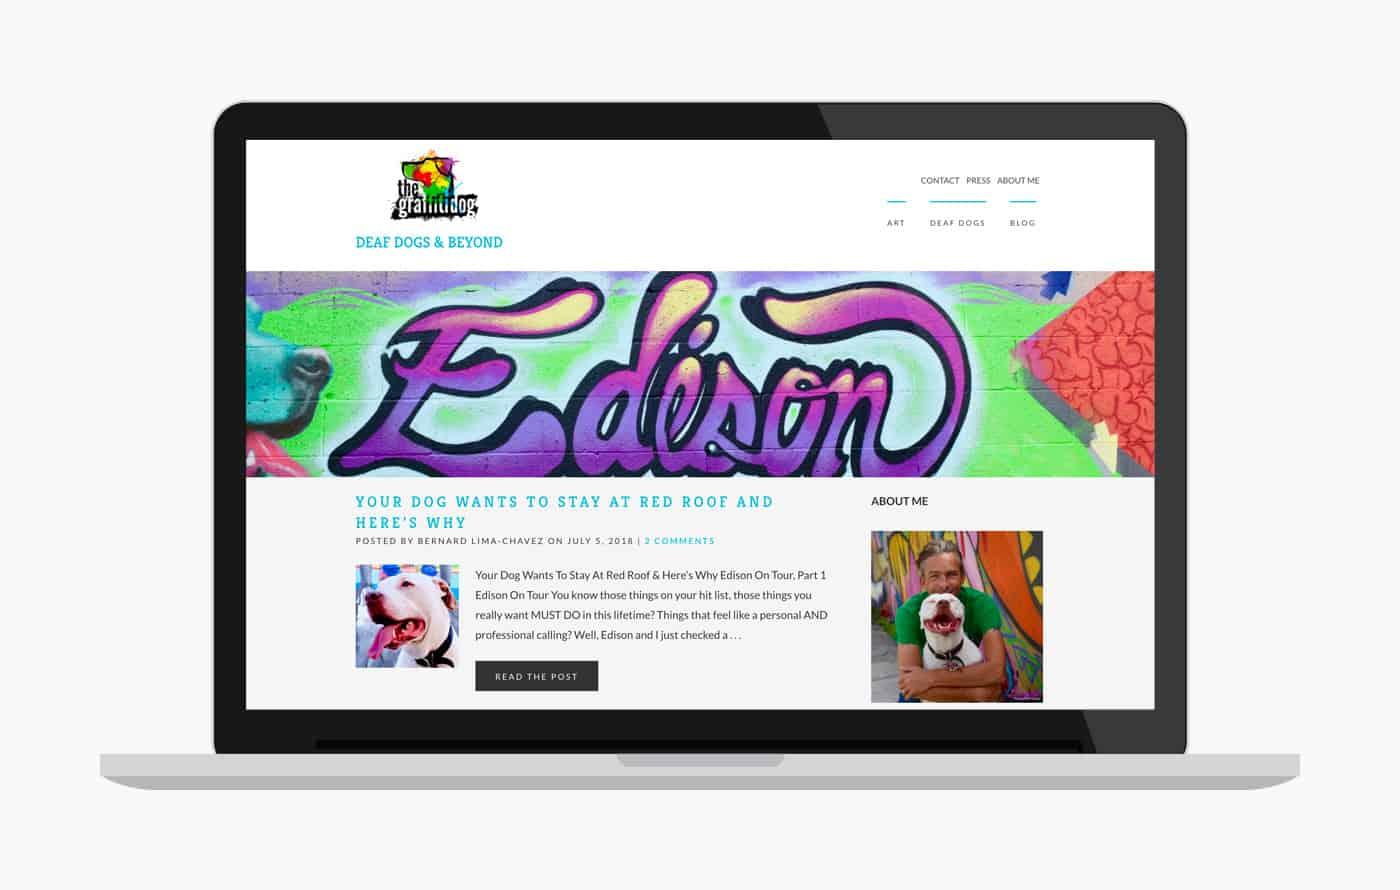 Wordpress Blog Design - Graffiti Dog